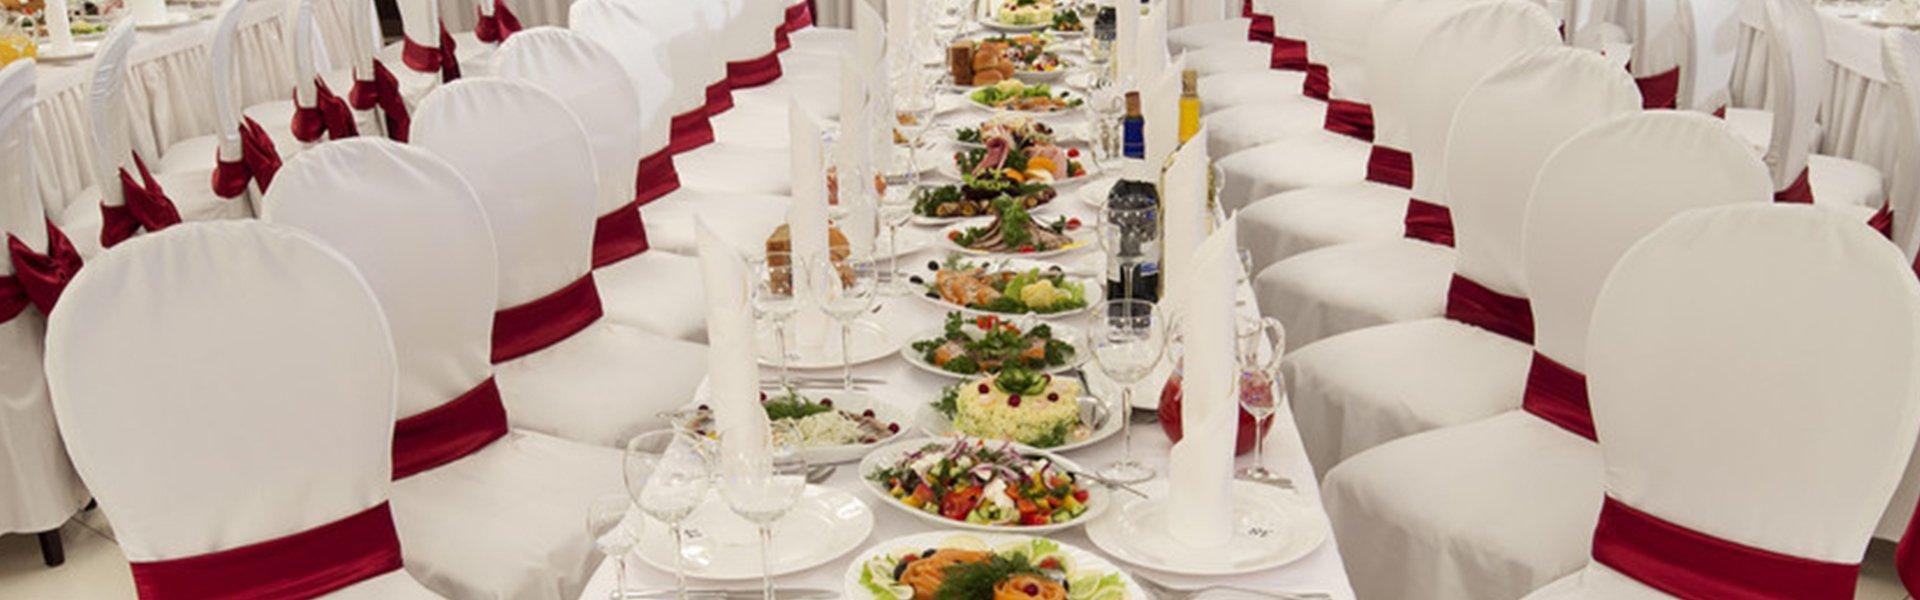 Wedding dining area